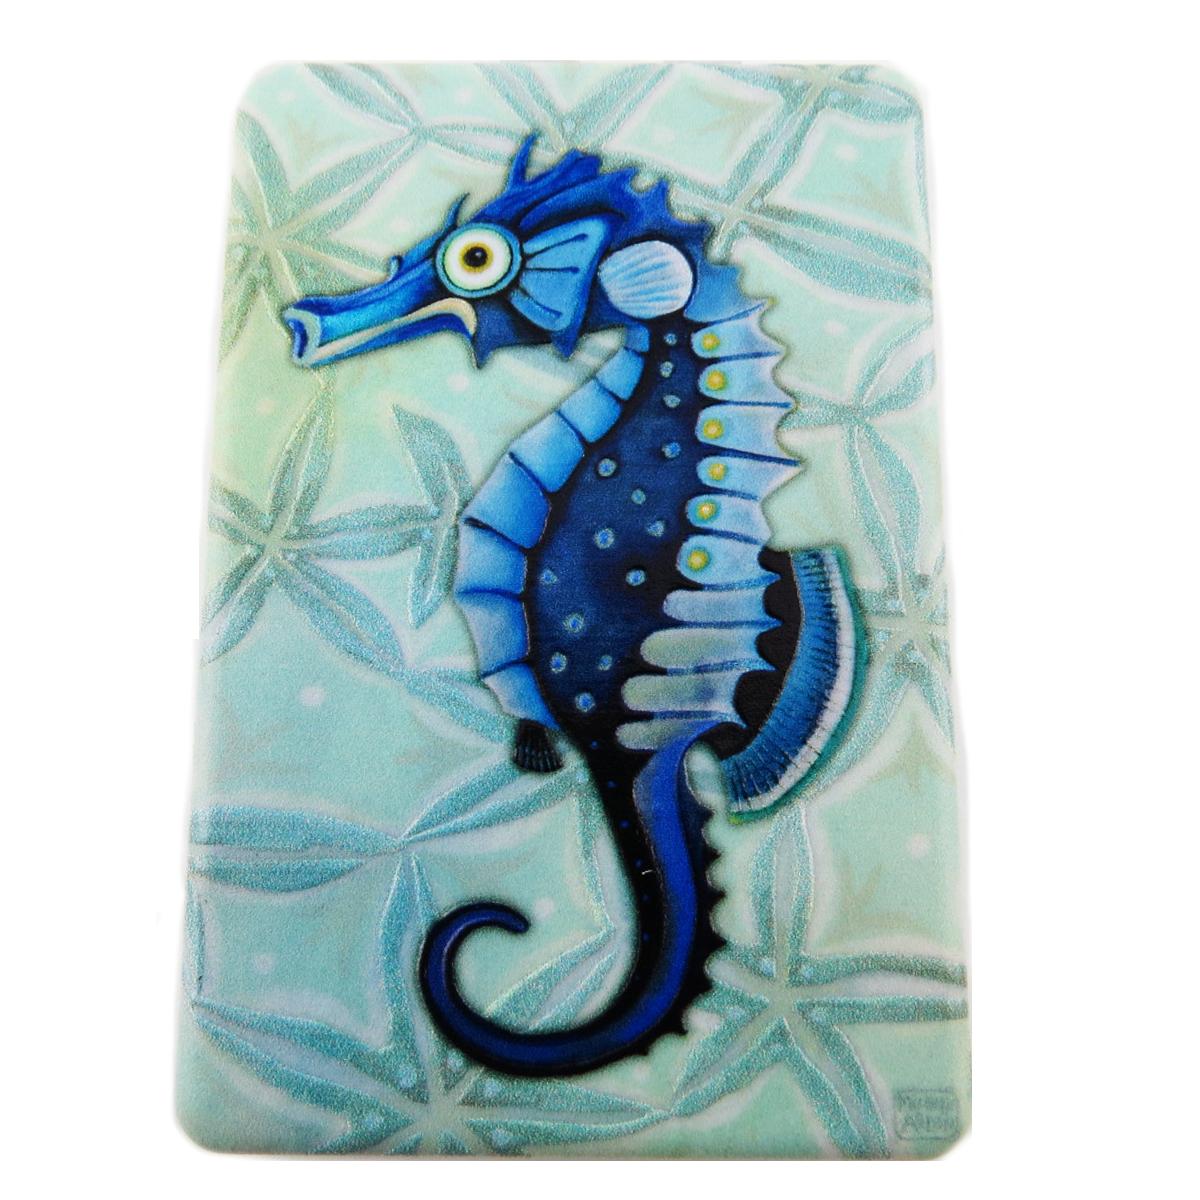 Miroir de poche \'Allen Designs\' bleu (hippocampe) - 85x55 cm - [R1978]